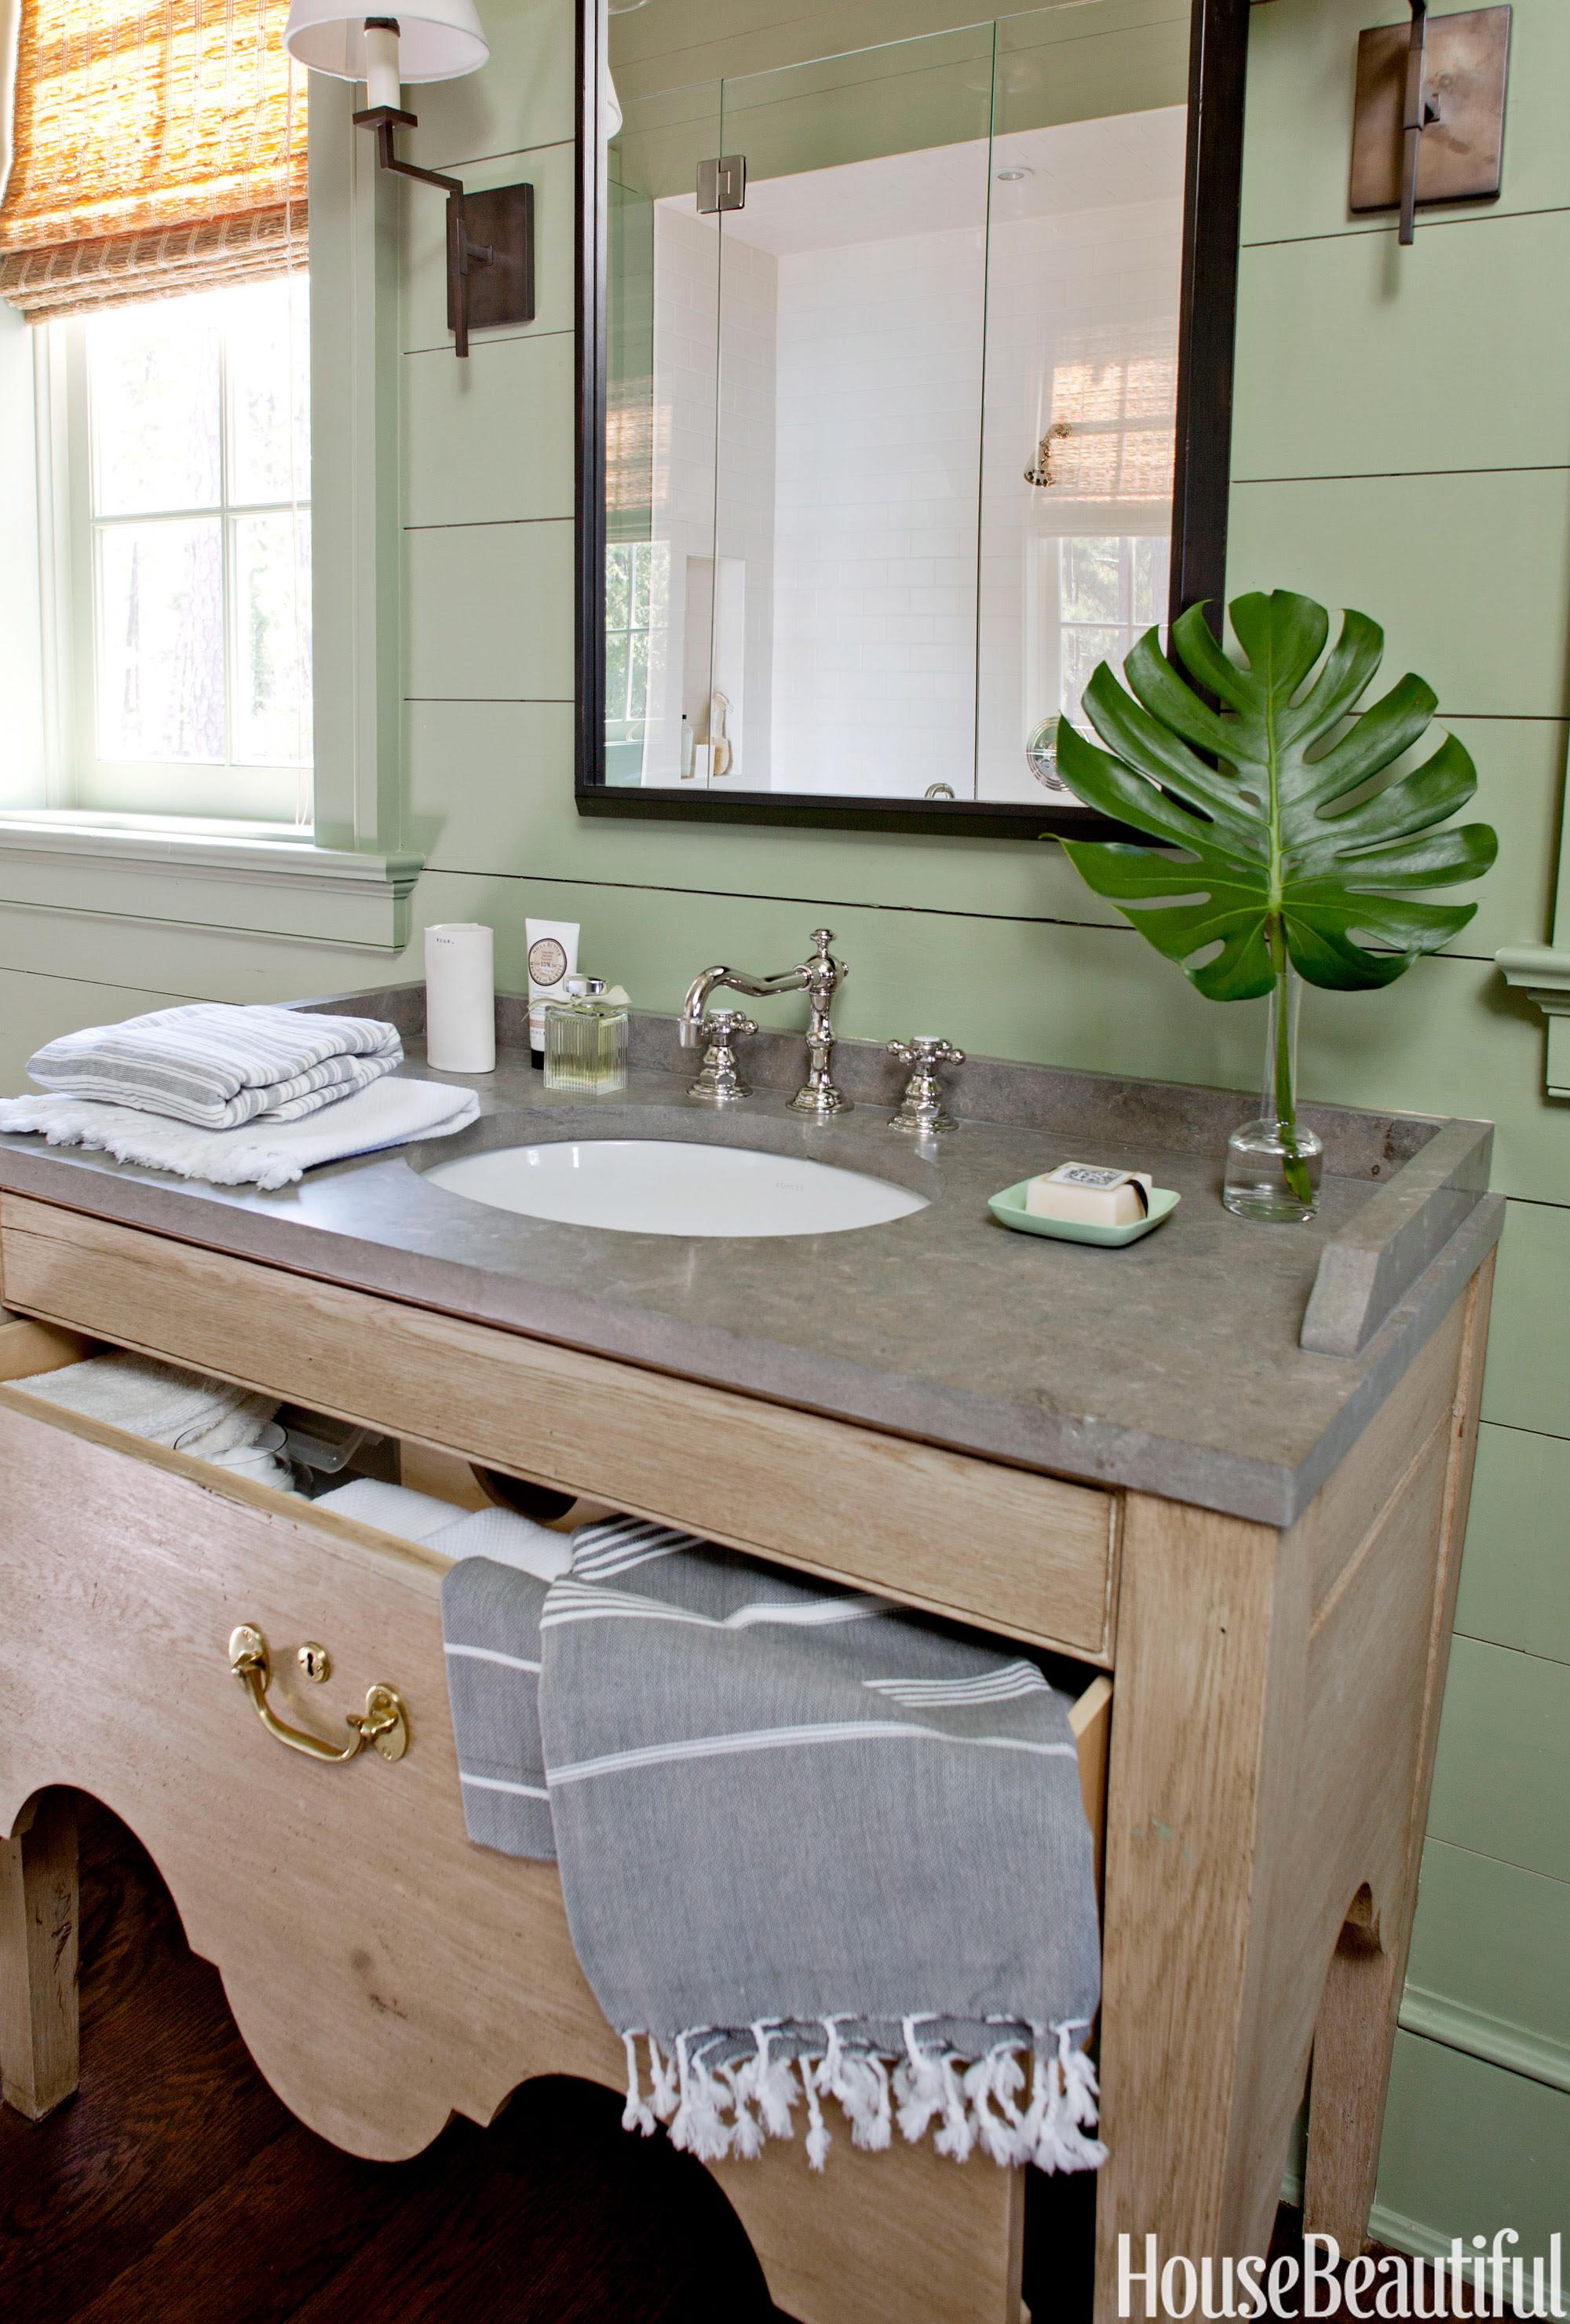 25 Small Bathroom Design Ideas - Small Bathroom Solutions